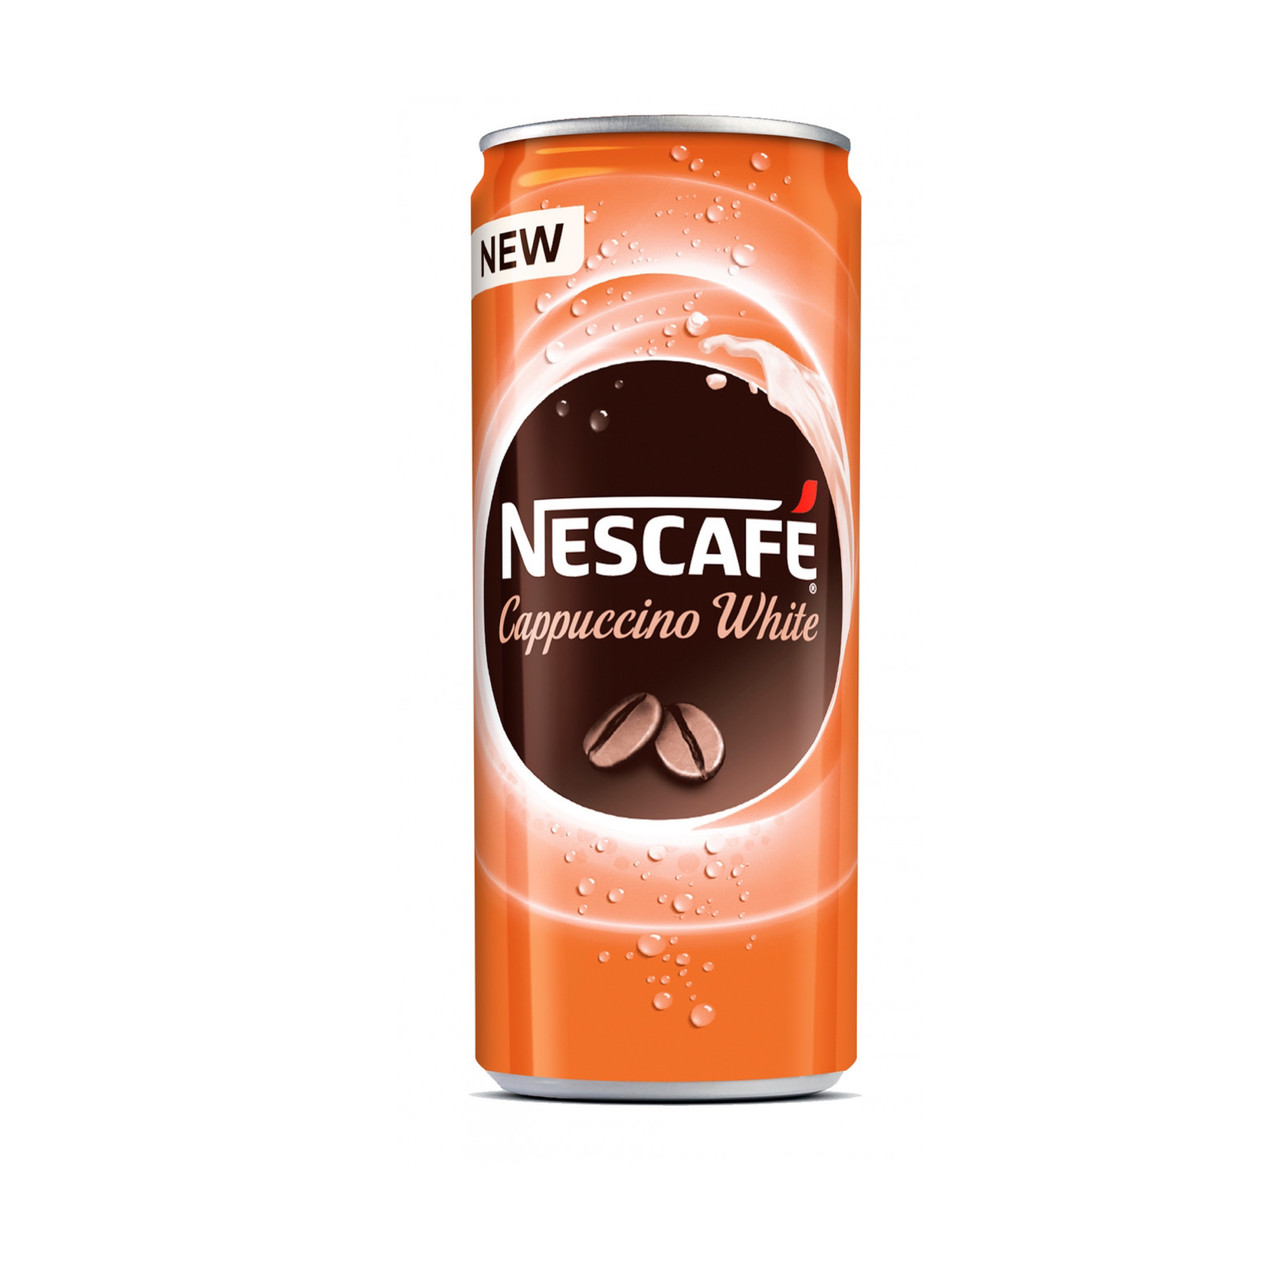 Холодный кофе Nescafé Cappuccino White